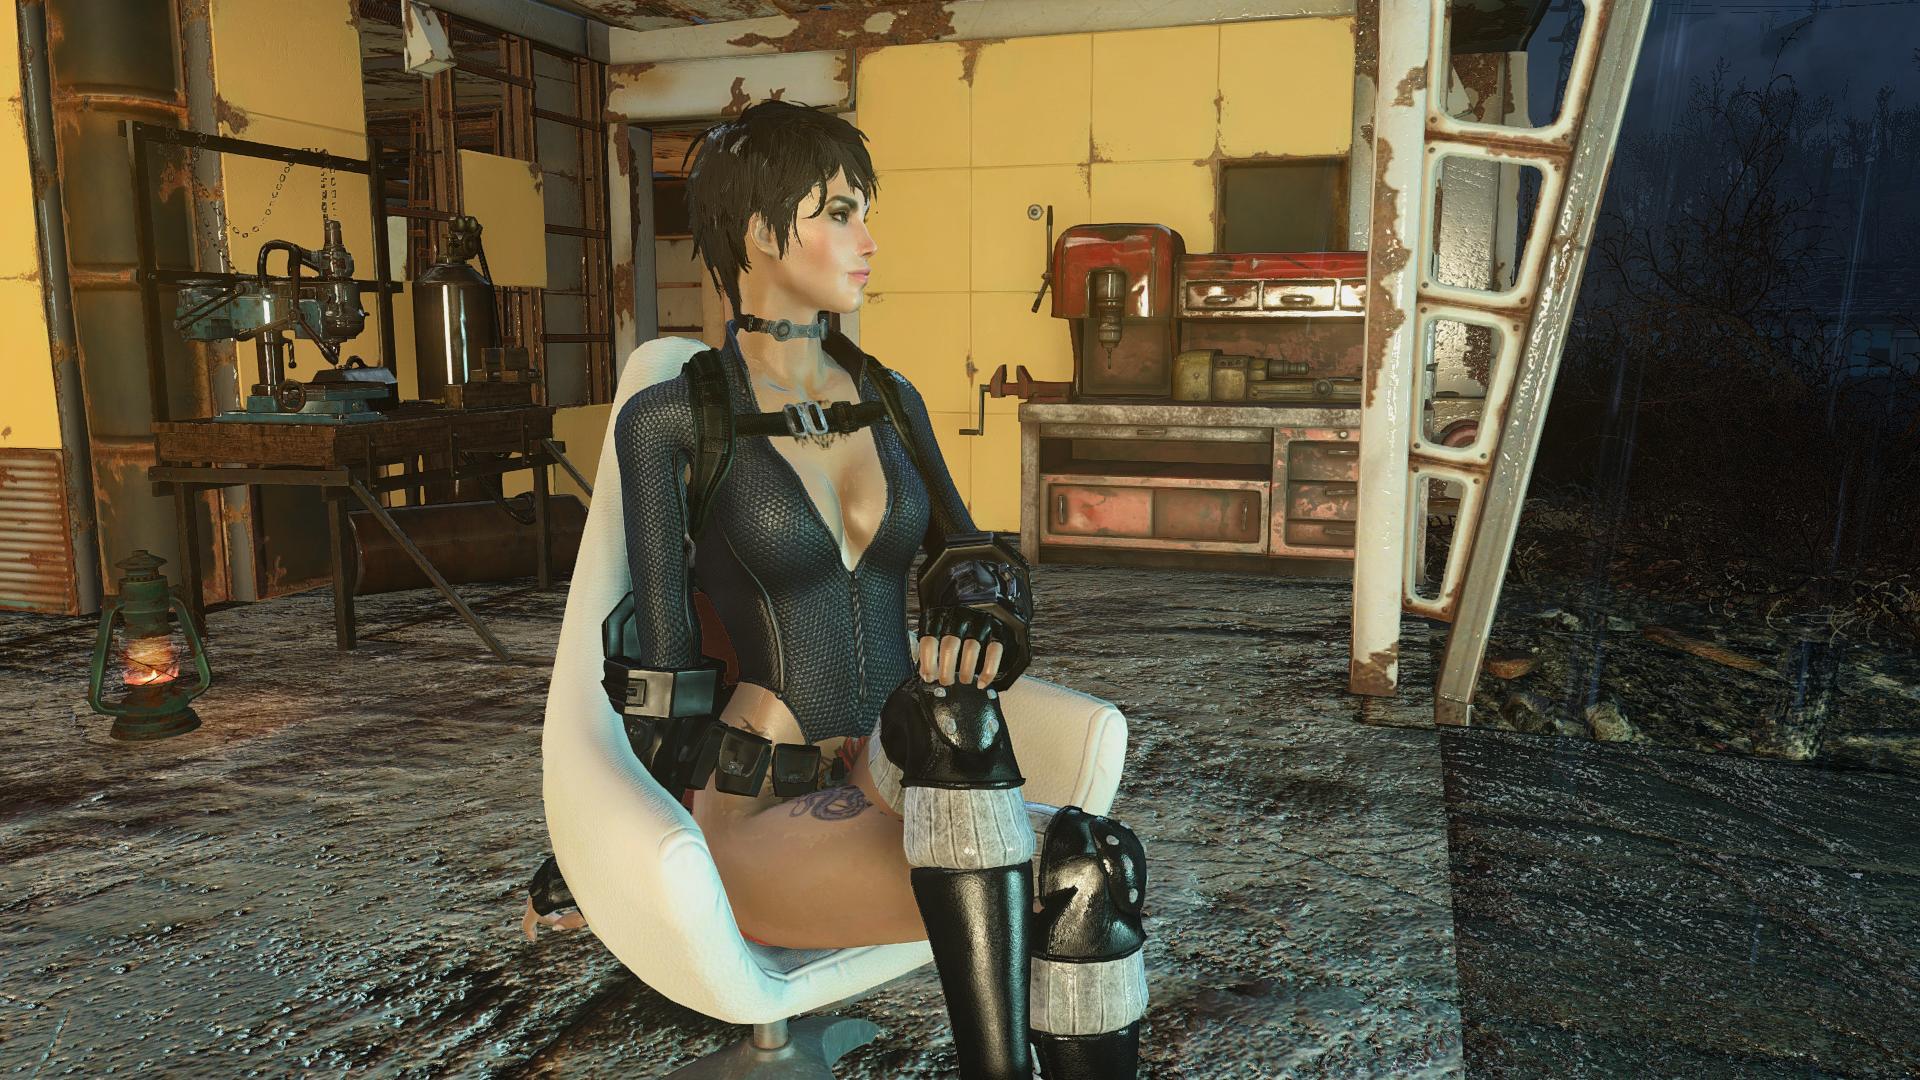 000575.Jpg - Fallout 4